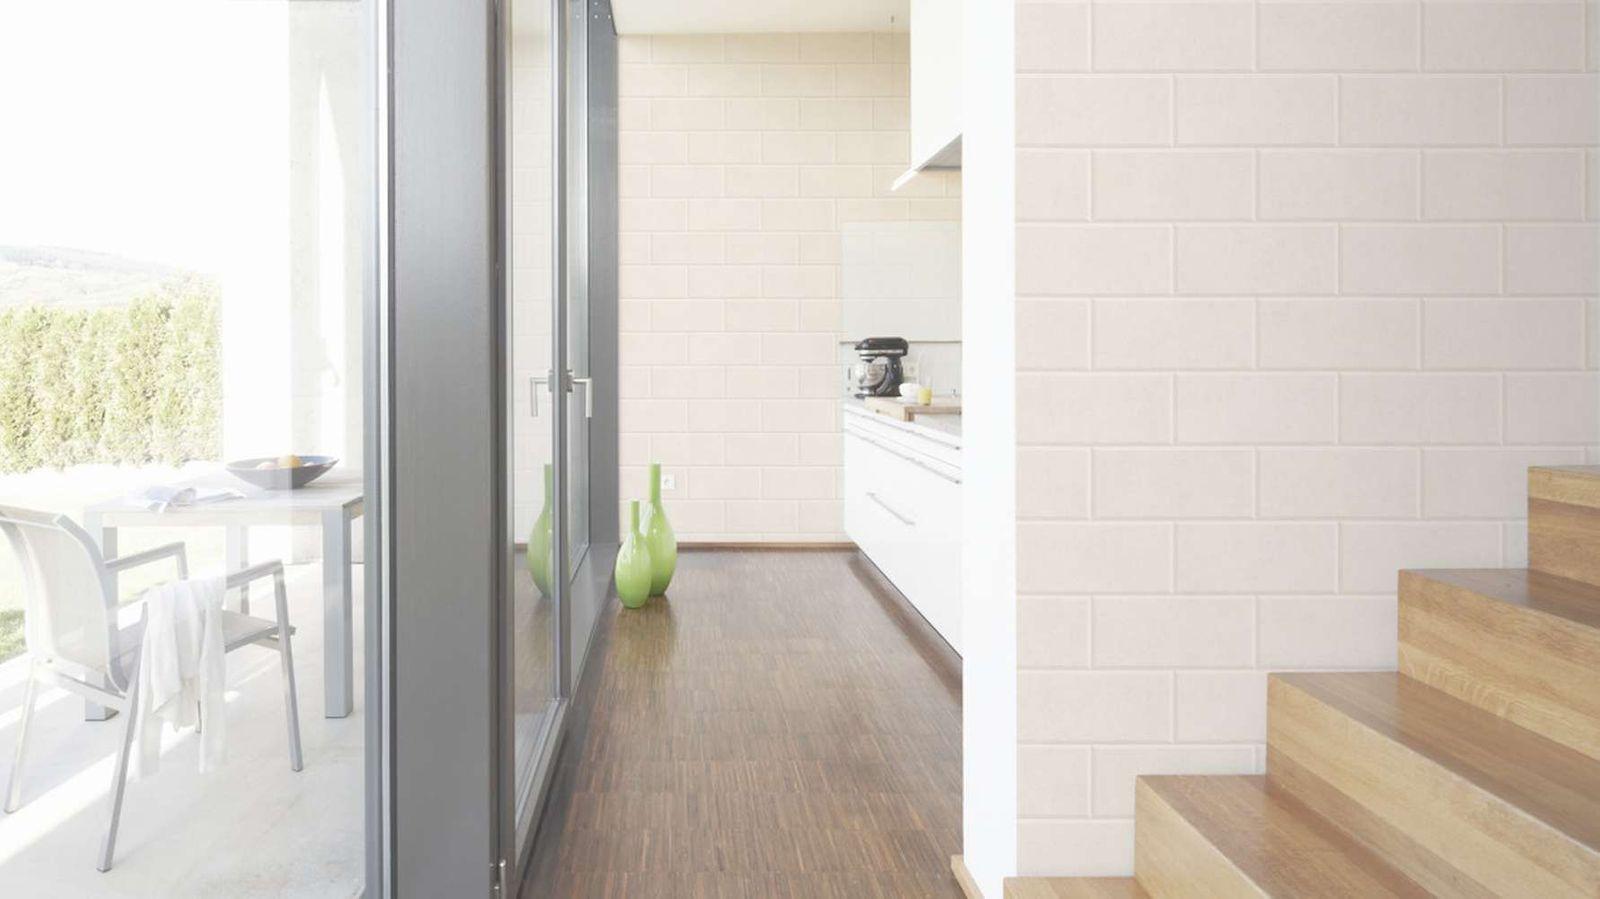 versace home tapete 3d fliesen cremebeige beige 34322 1. Black Bedroom Furniture Sets. Home Design Ideas